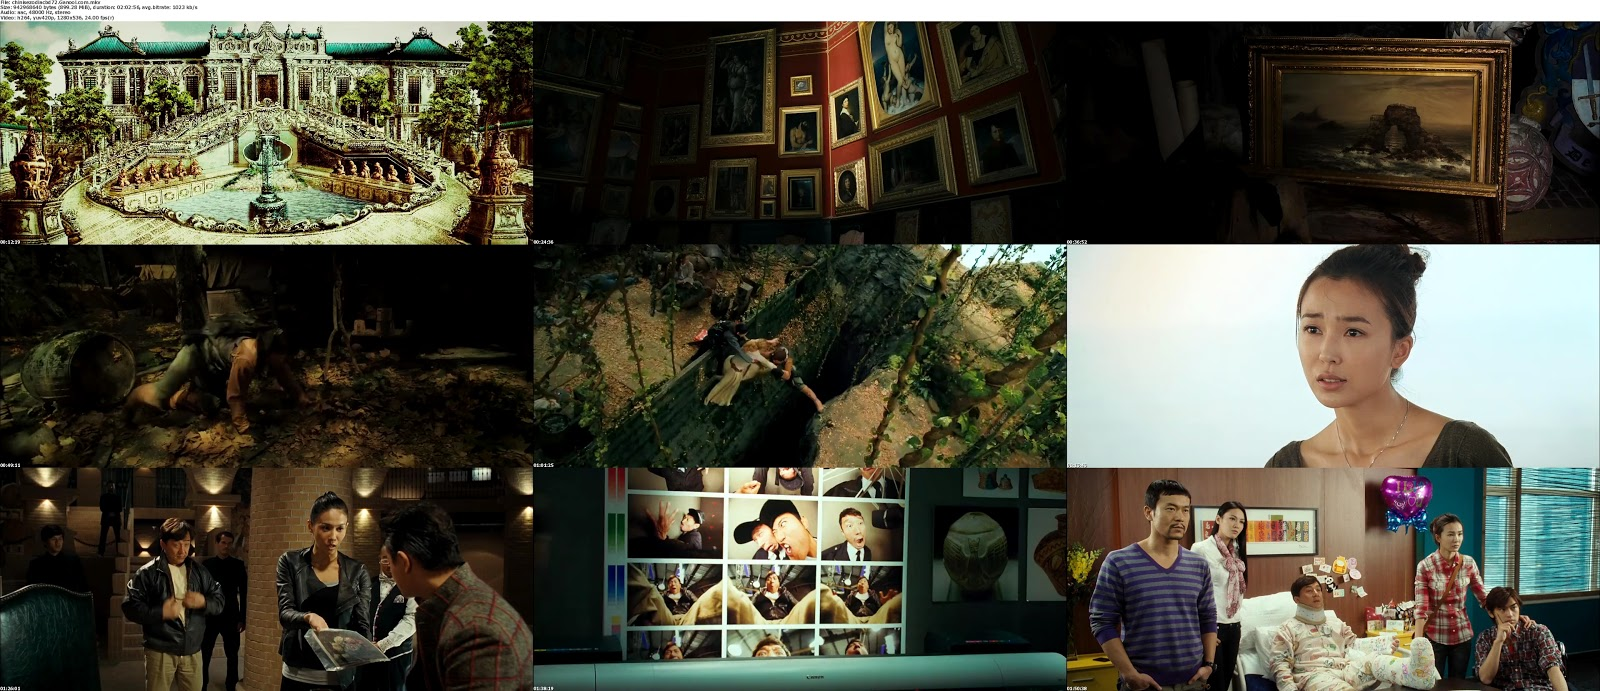 chinese zodiac 720p 900mb movie 21